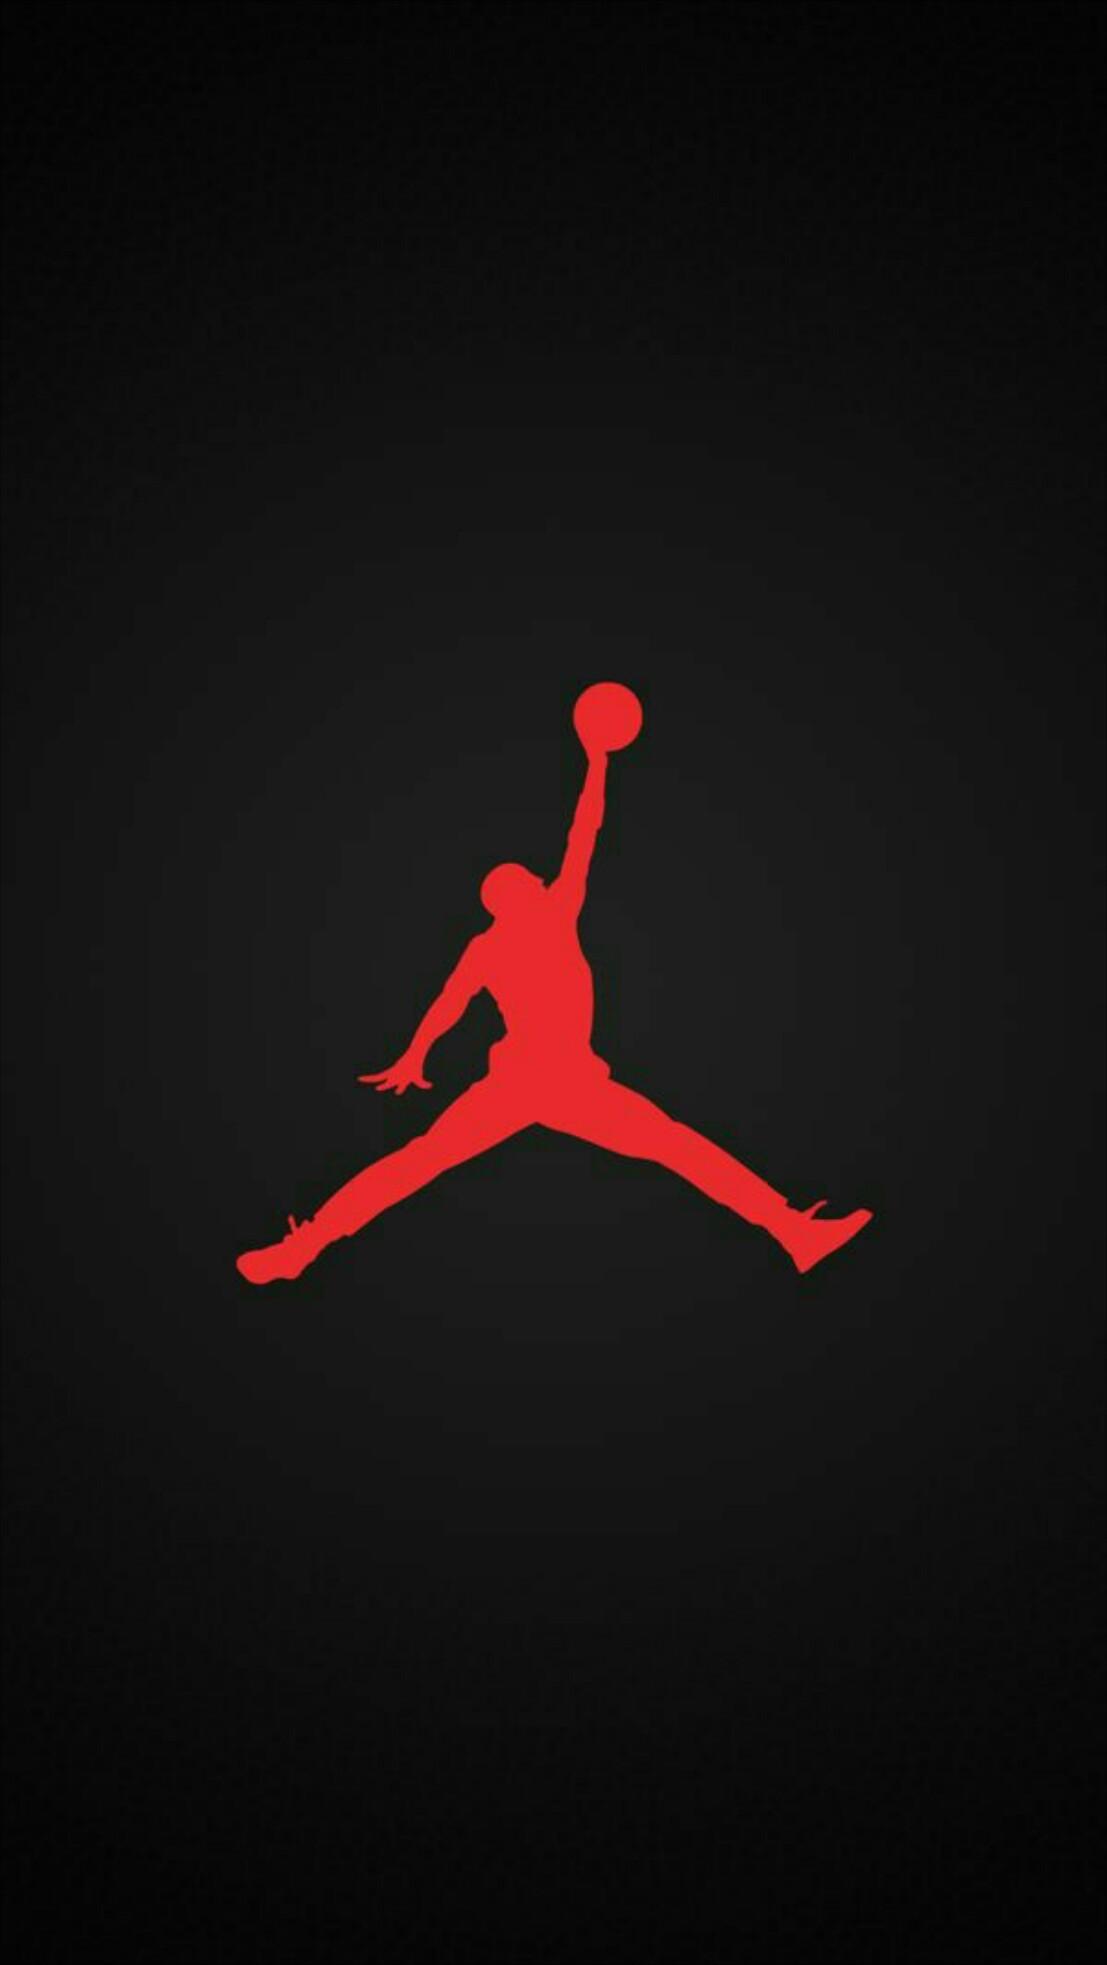 Nike Wallpaper Hd For Android Phone Impremedia Net